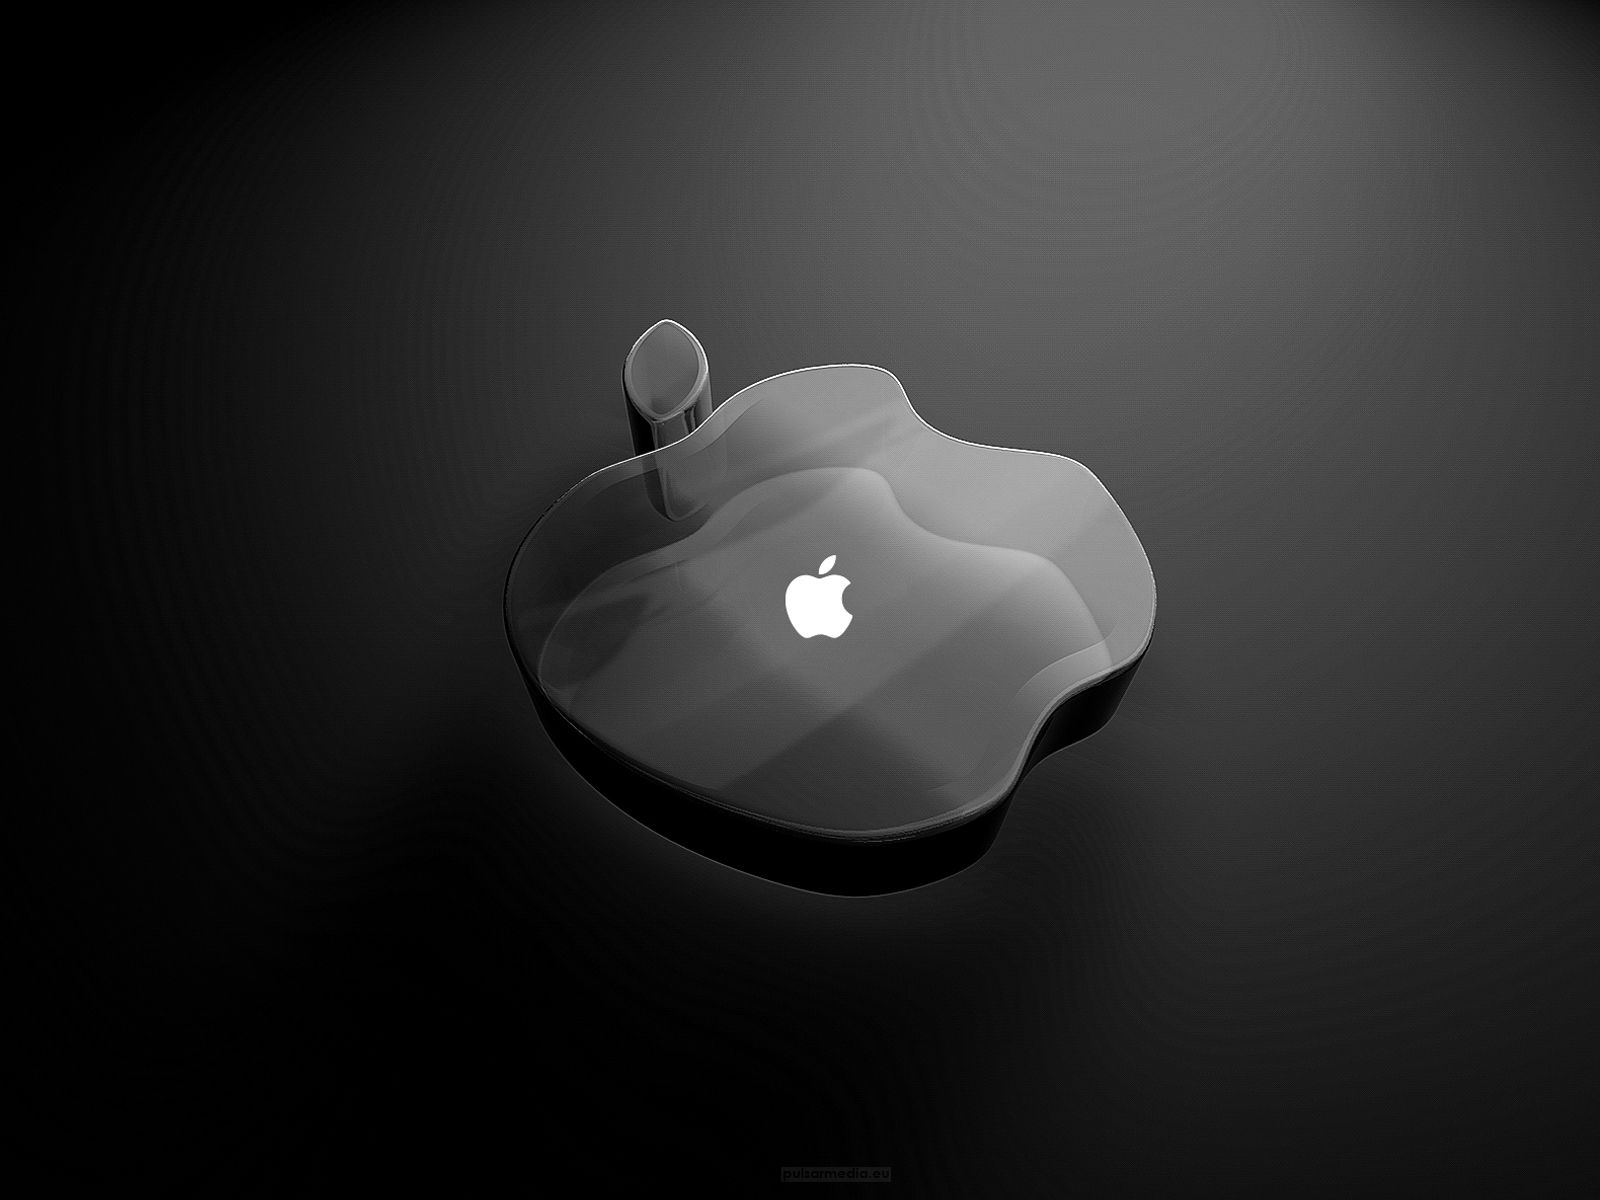 3d Mac Wallpapers Top Free 3d Mac Backgrounds